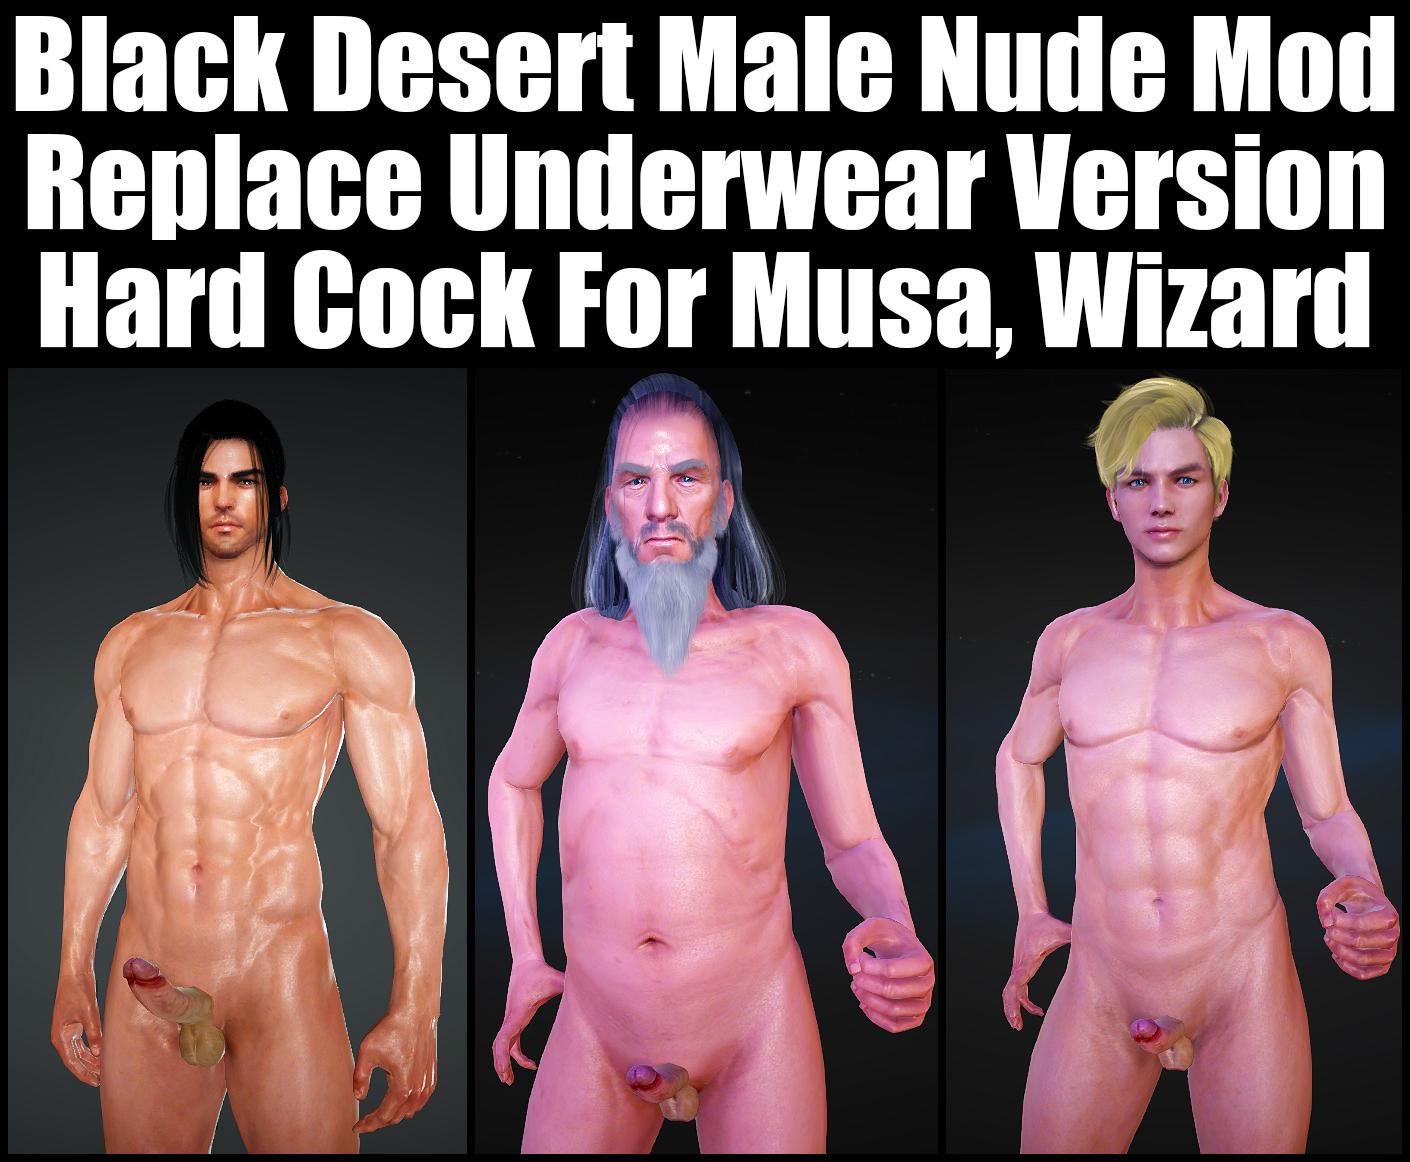 Black Desert Male Nude Mod [Replace Underwear Version][Hard Cock] For Musa, Wizard.jpg